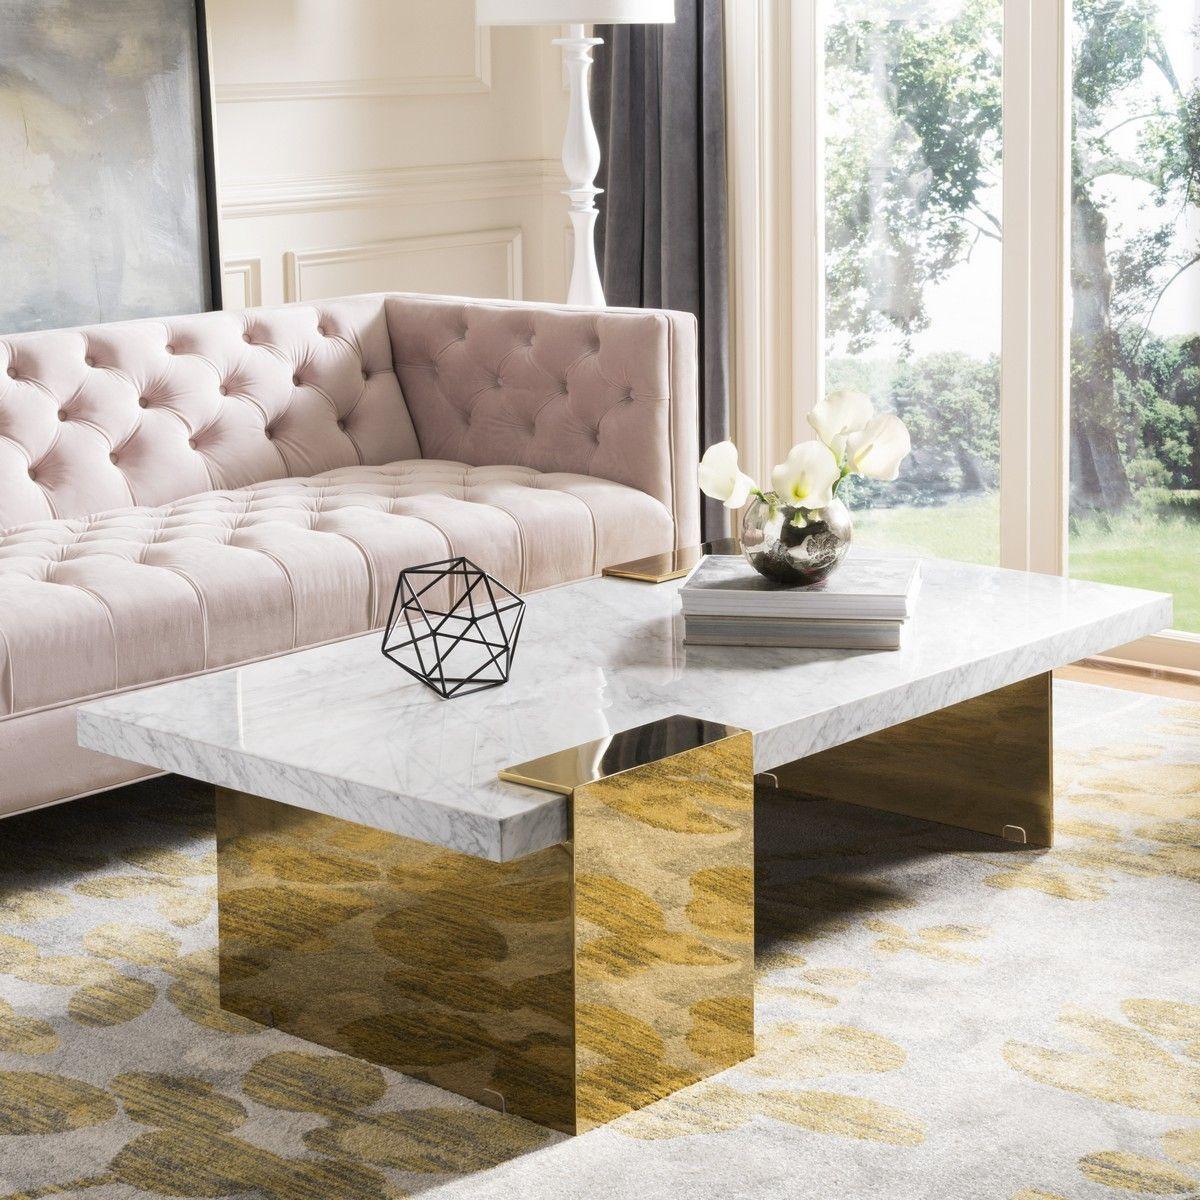 Sfv3541a 2bx Safavieh Solid Coffee Table Marble Coffee Table Coffee Table White [ 1200 x 1200 Pixel ]